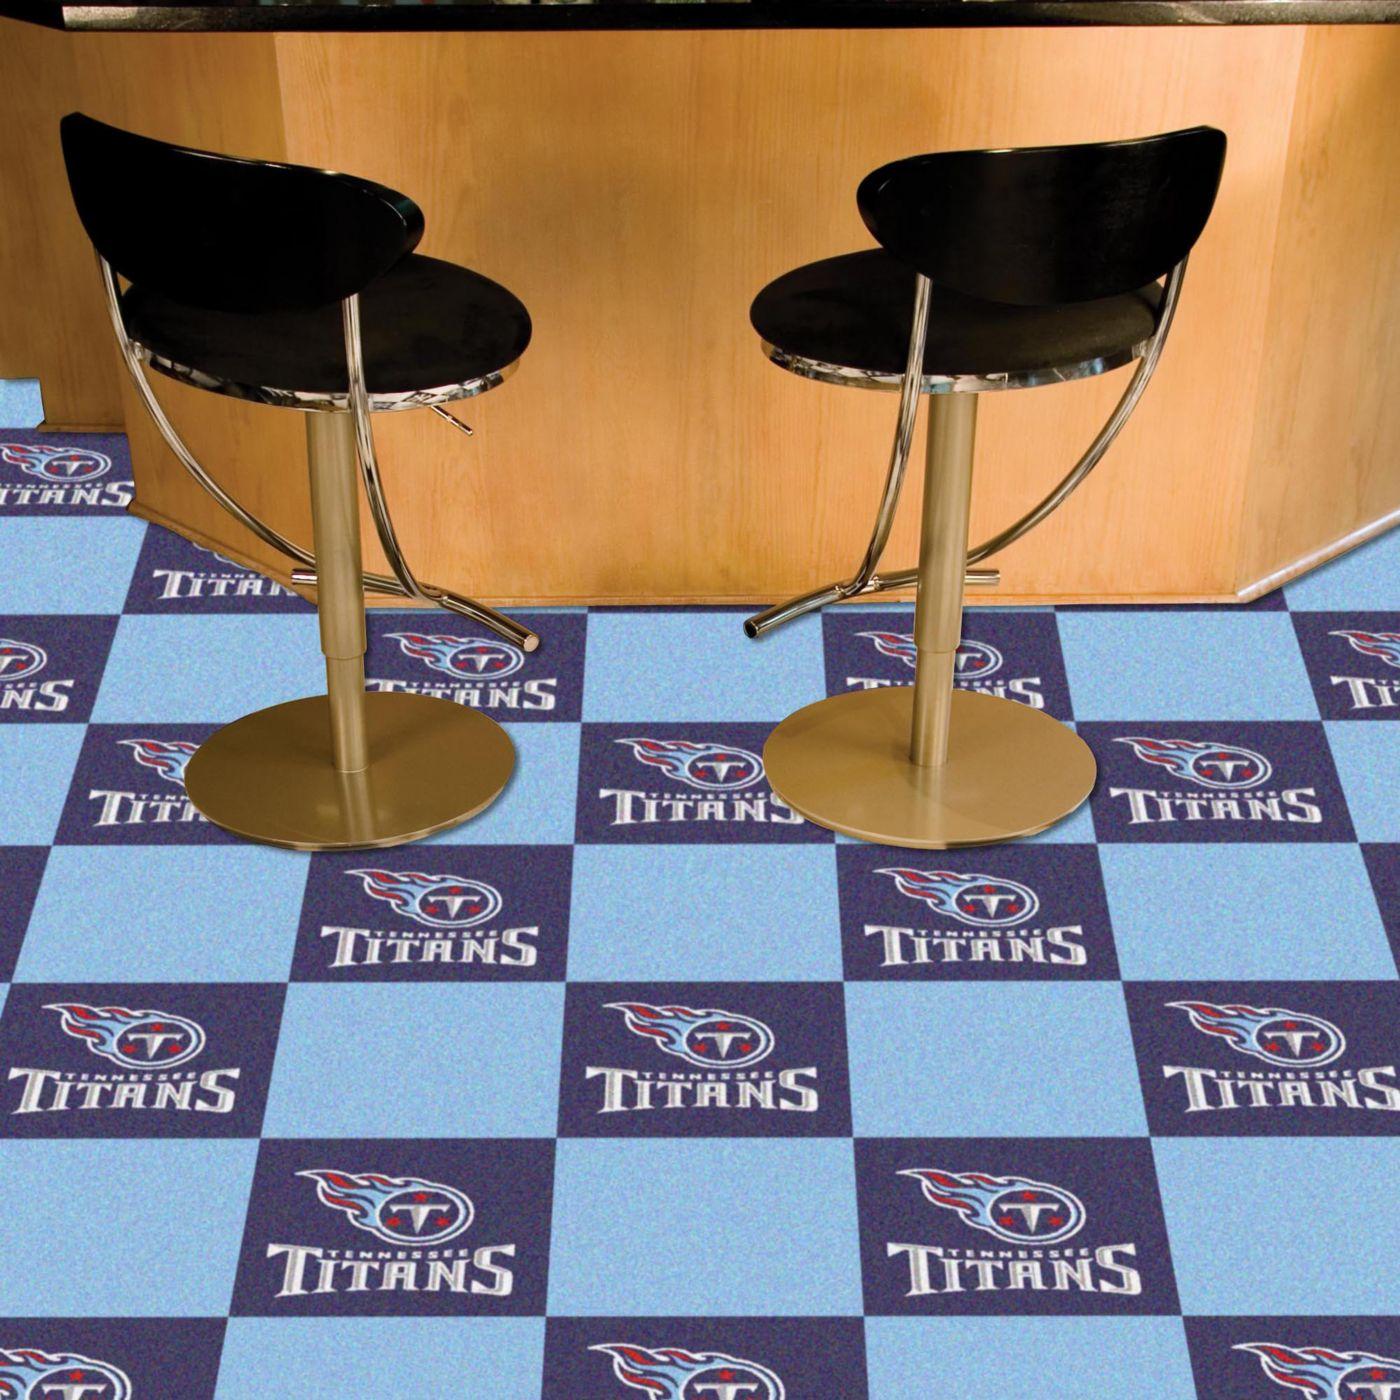 FANMATS Tennessee Titans Team Carpet Tiles